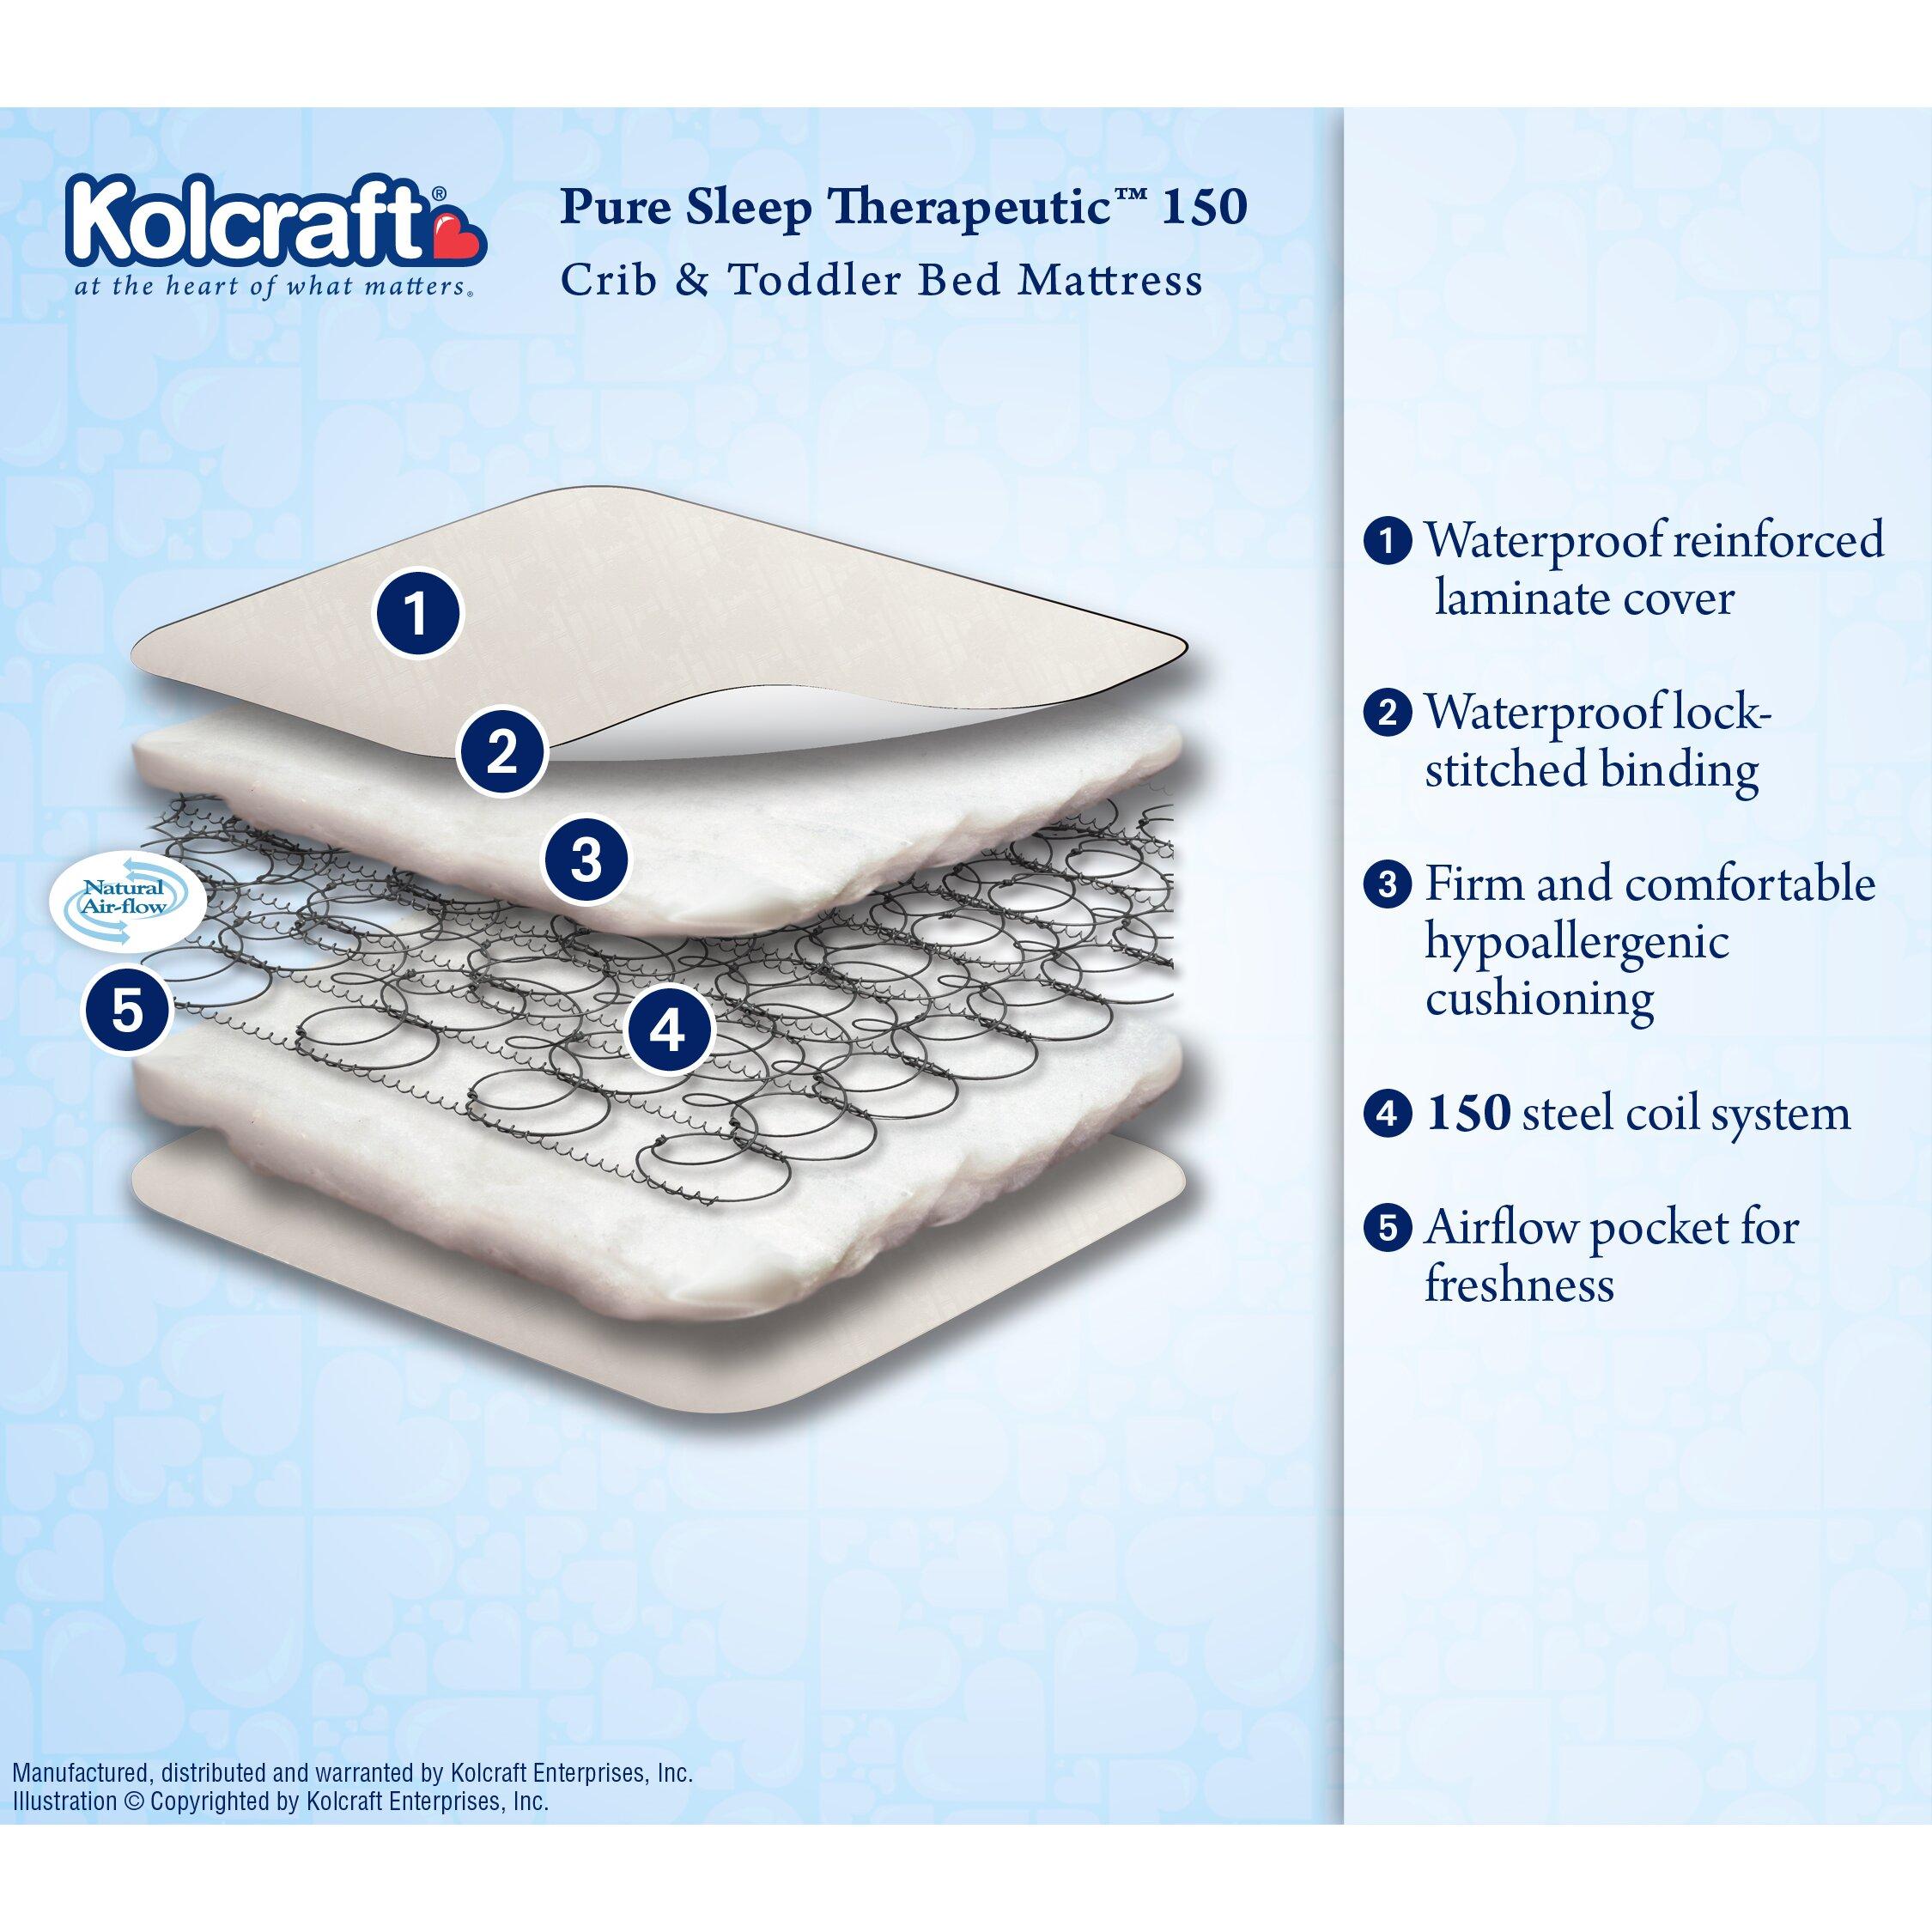 Kolcraft Pure Sleep Therapeutic 150 Crib Amp 5 Quot Toddler Bed Mattress Amp Reviews Wayfair